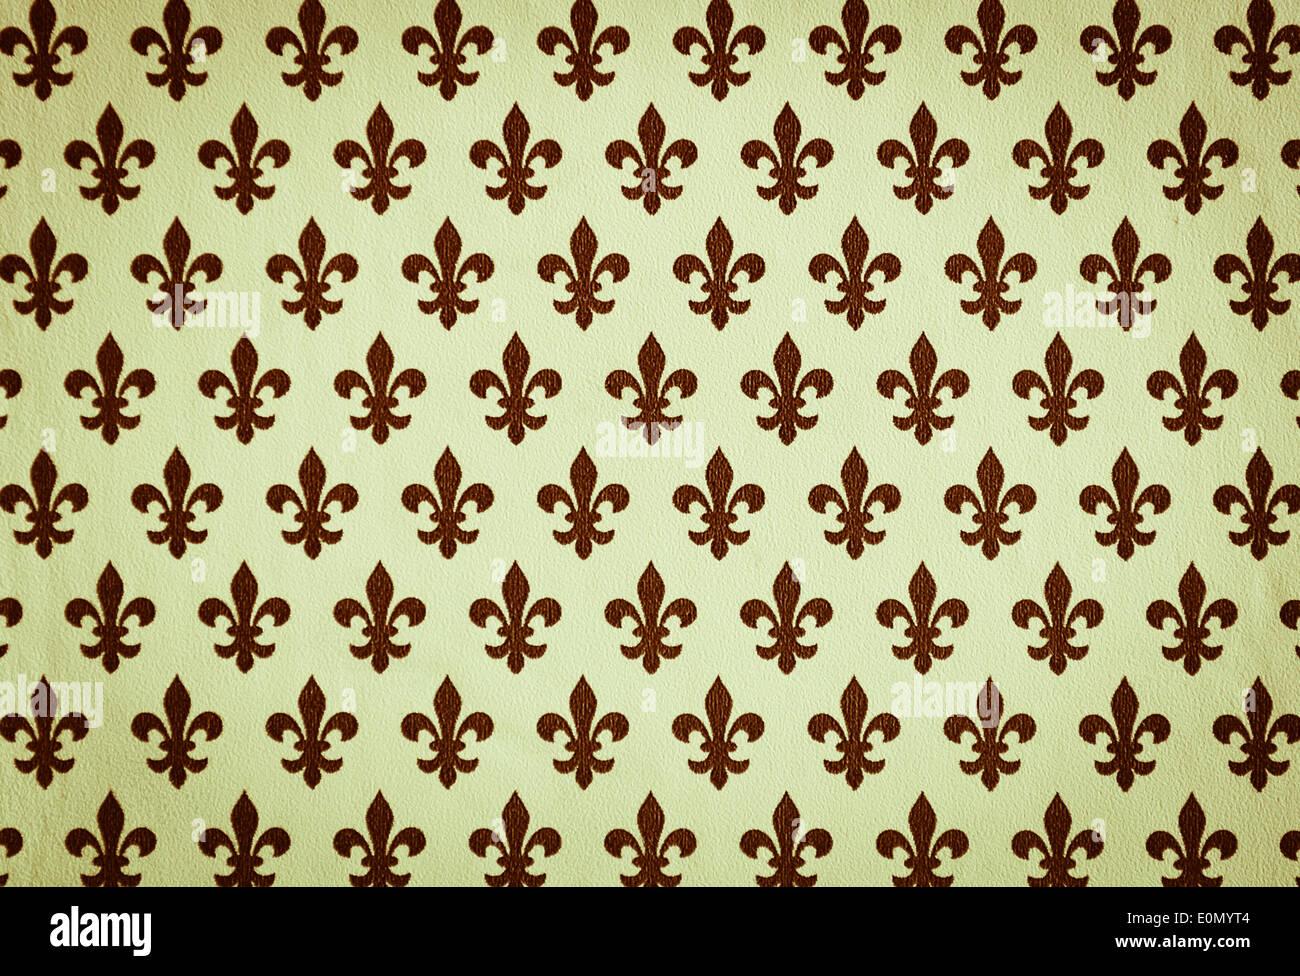 Lily flower heraldic symbol texture stock photo 69302356 alamy lily flower heraldic symbol texture izmirmasajfo